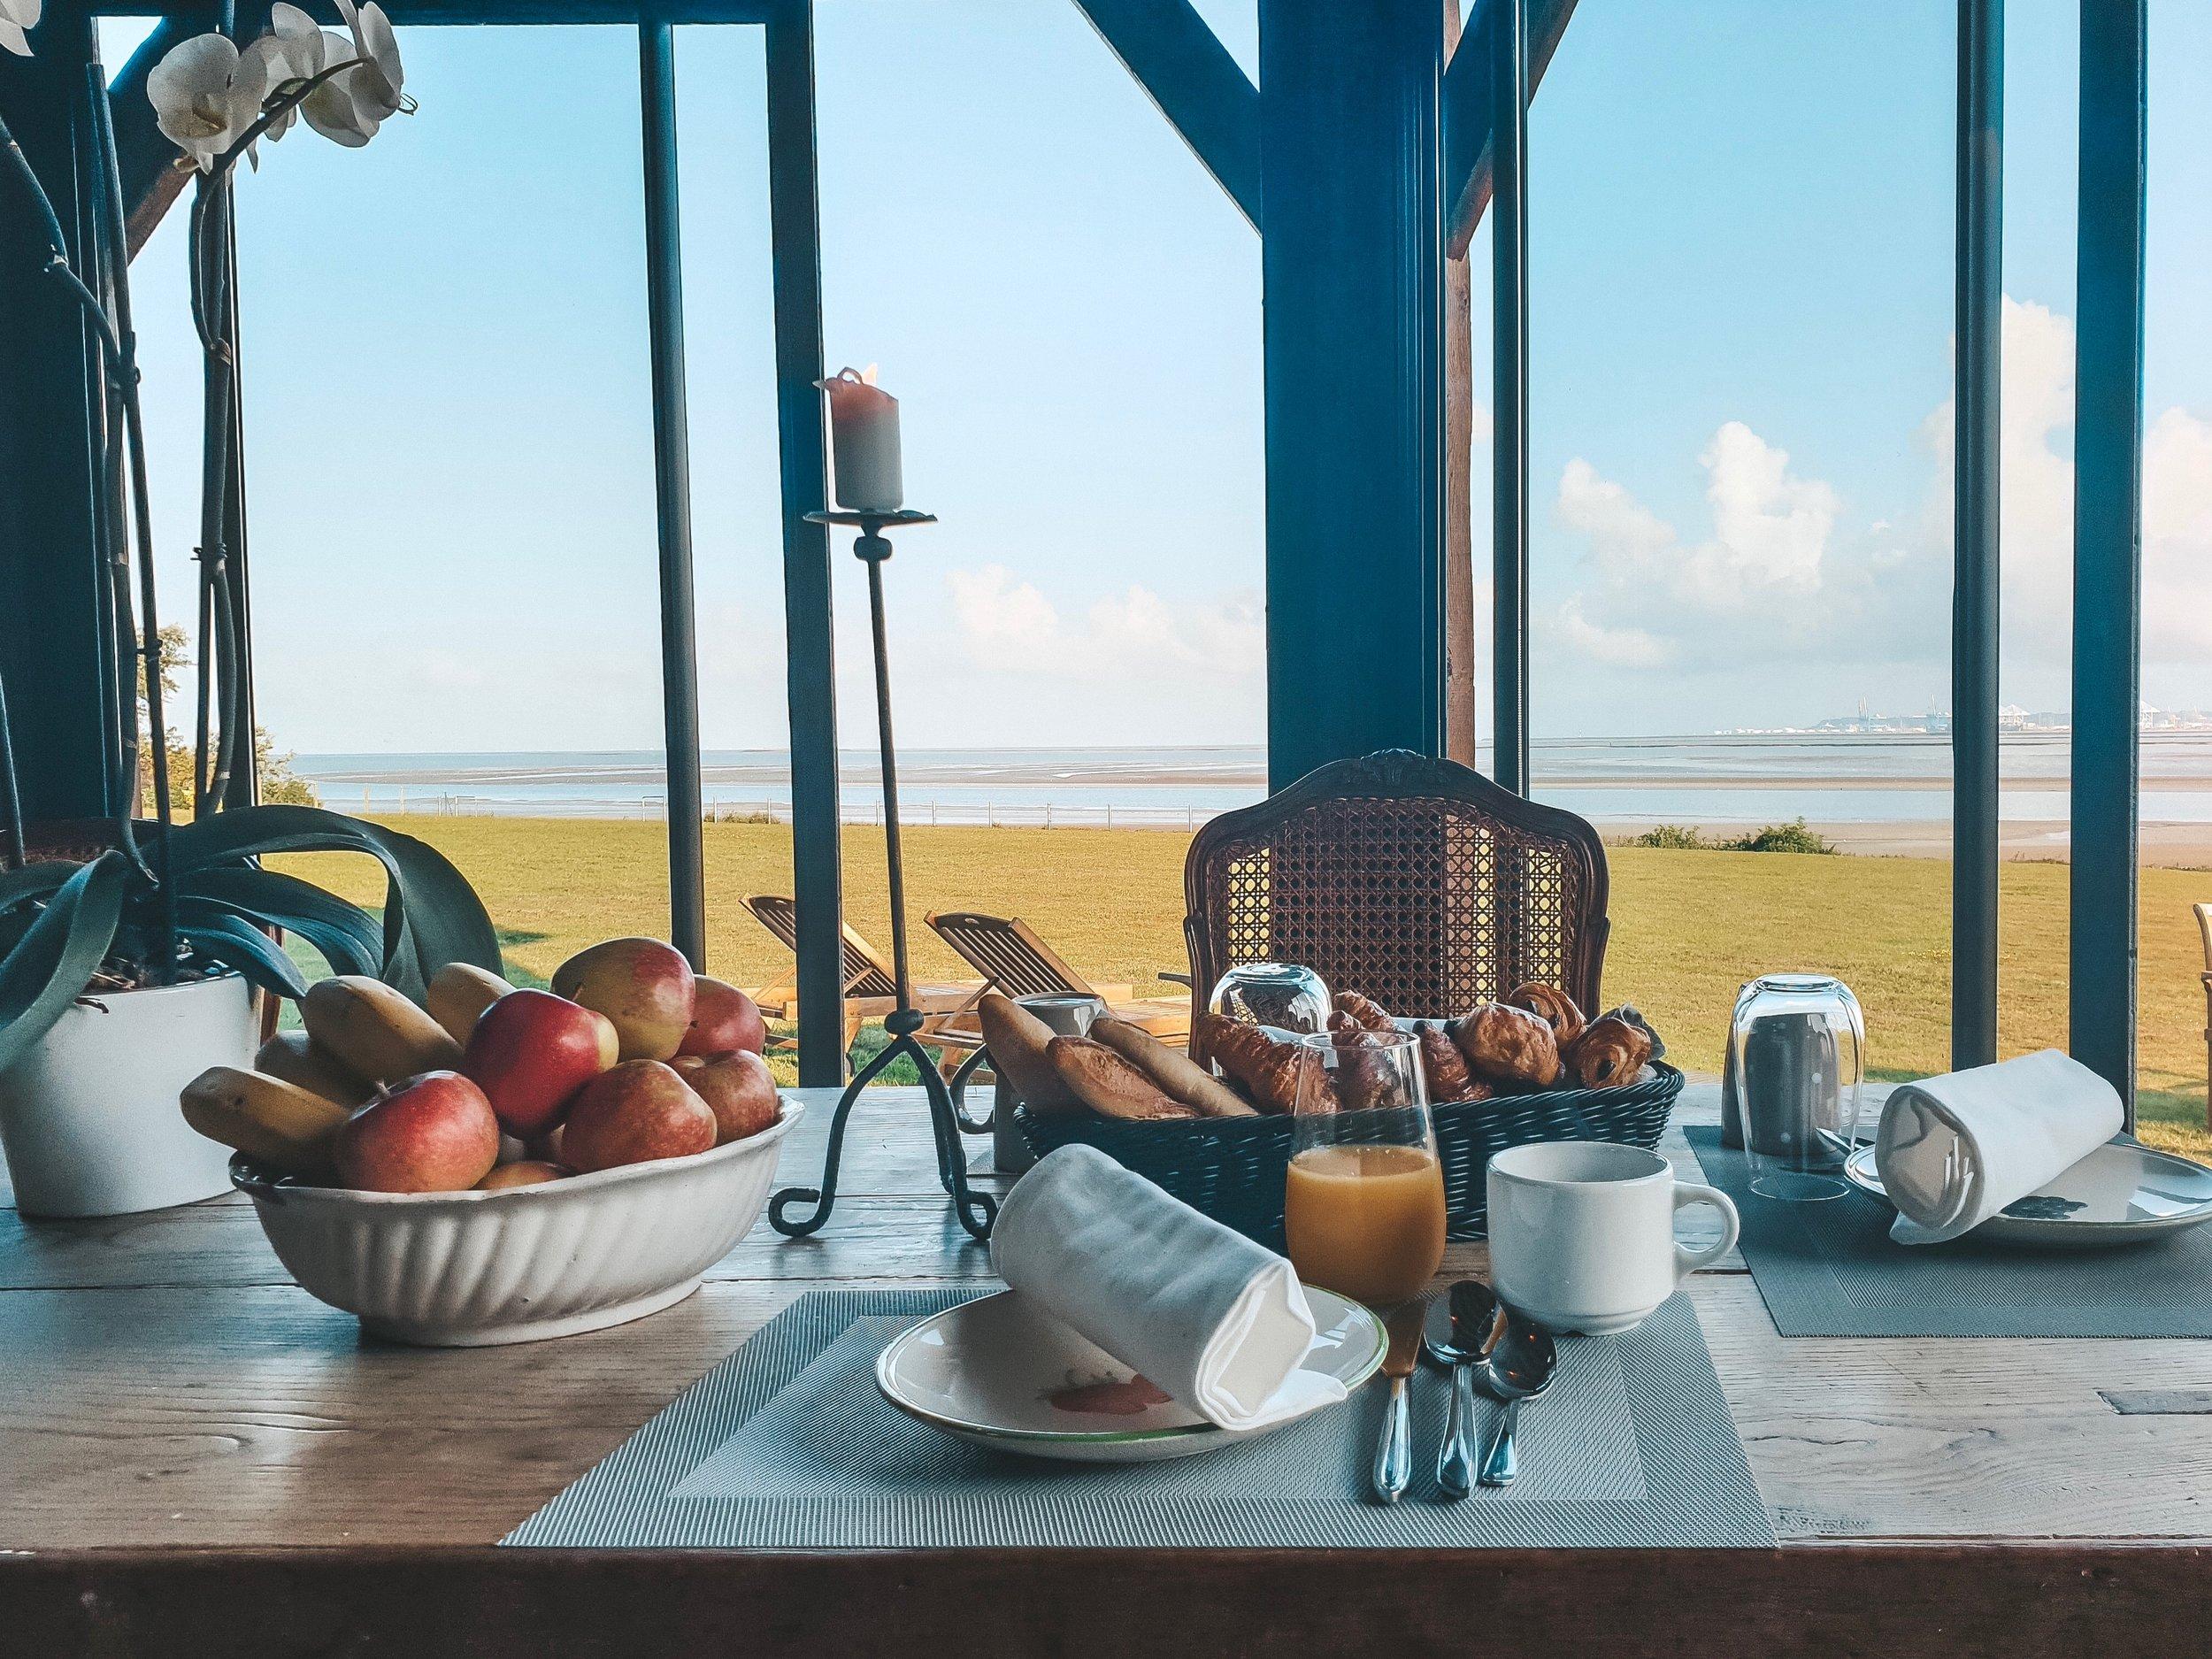 Petit déjeuner servi au salon face à la mer